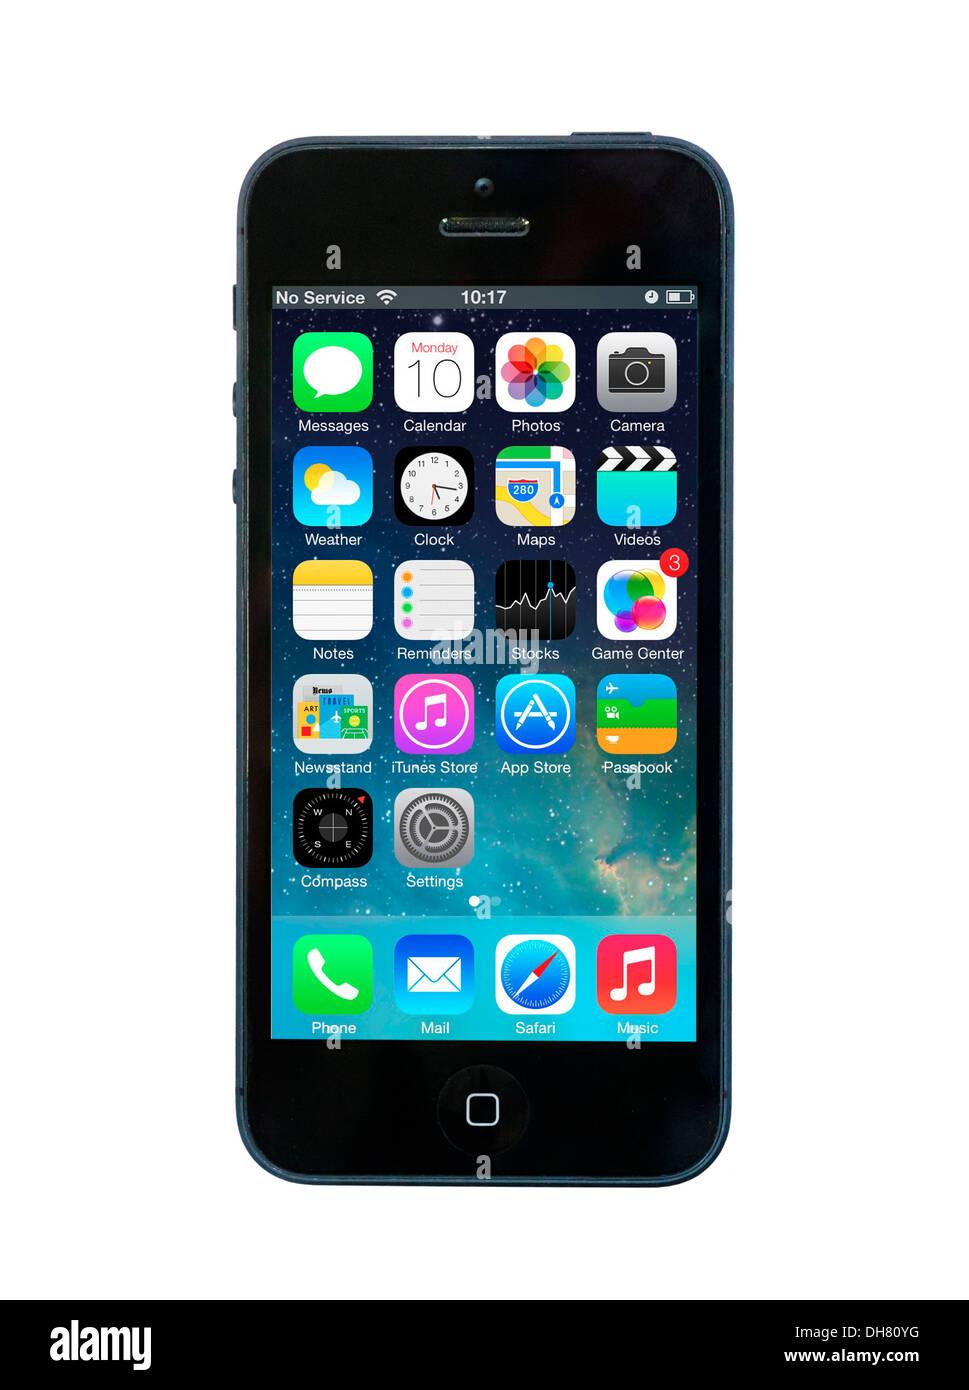 iPhone 5 smartphone - Stock Image